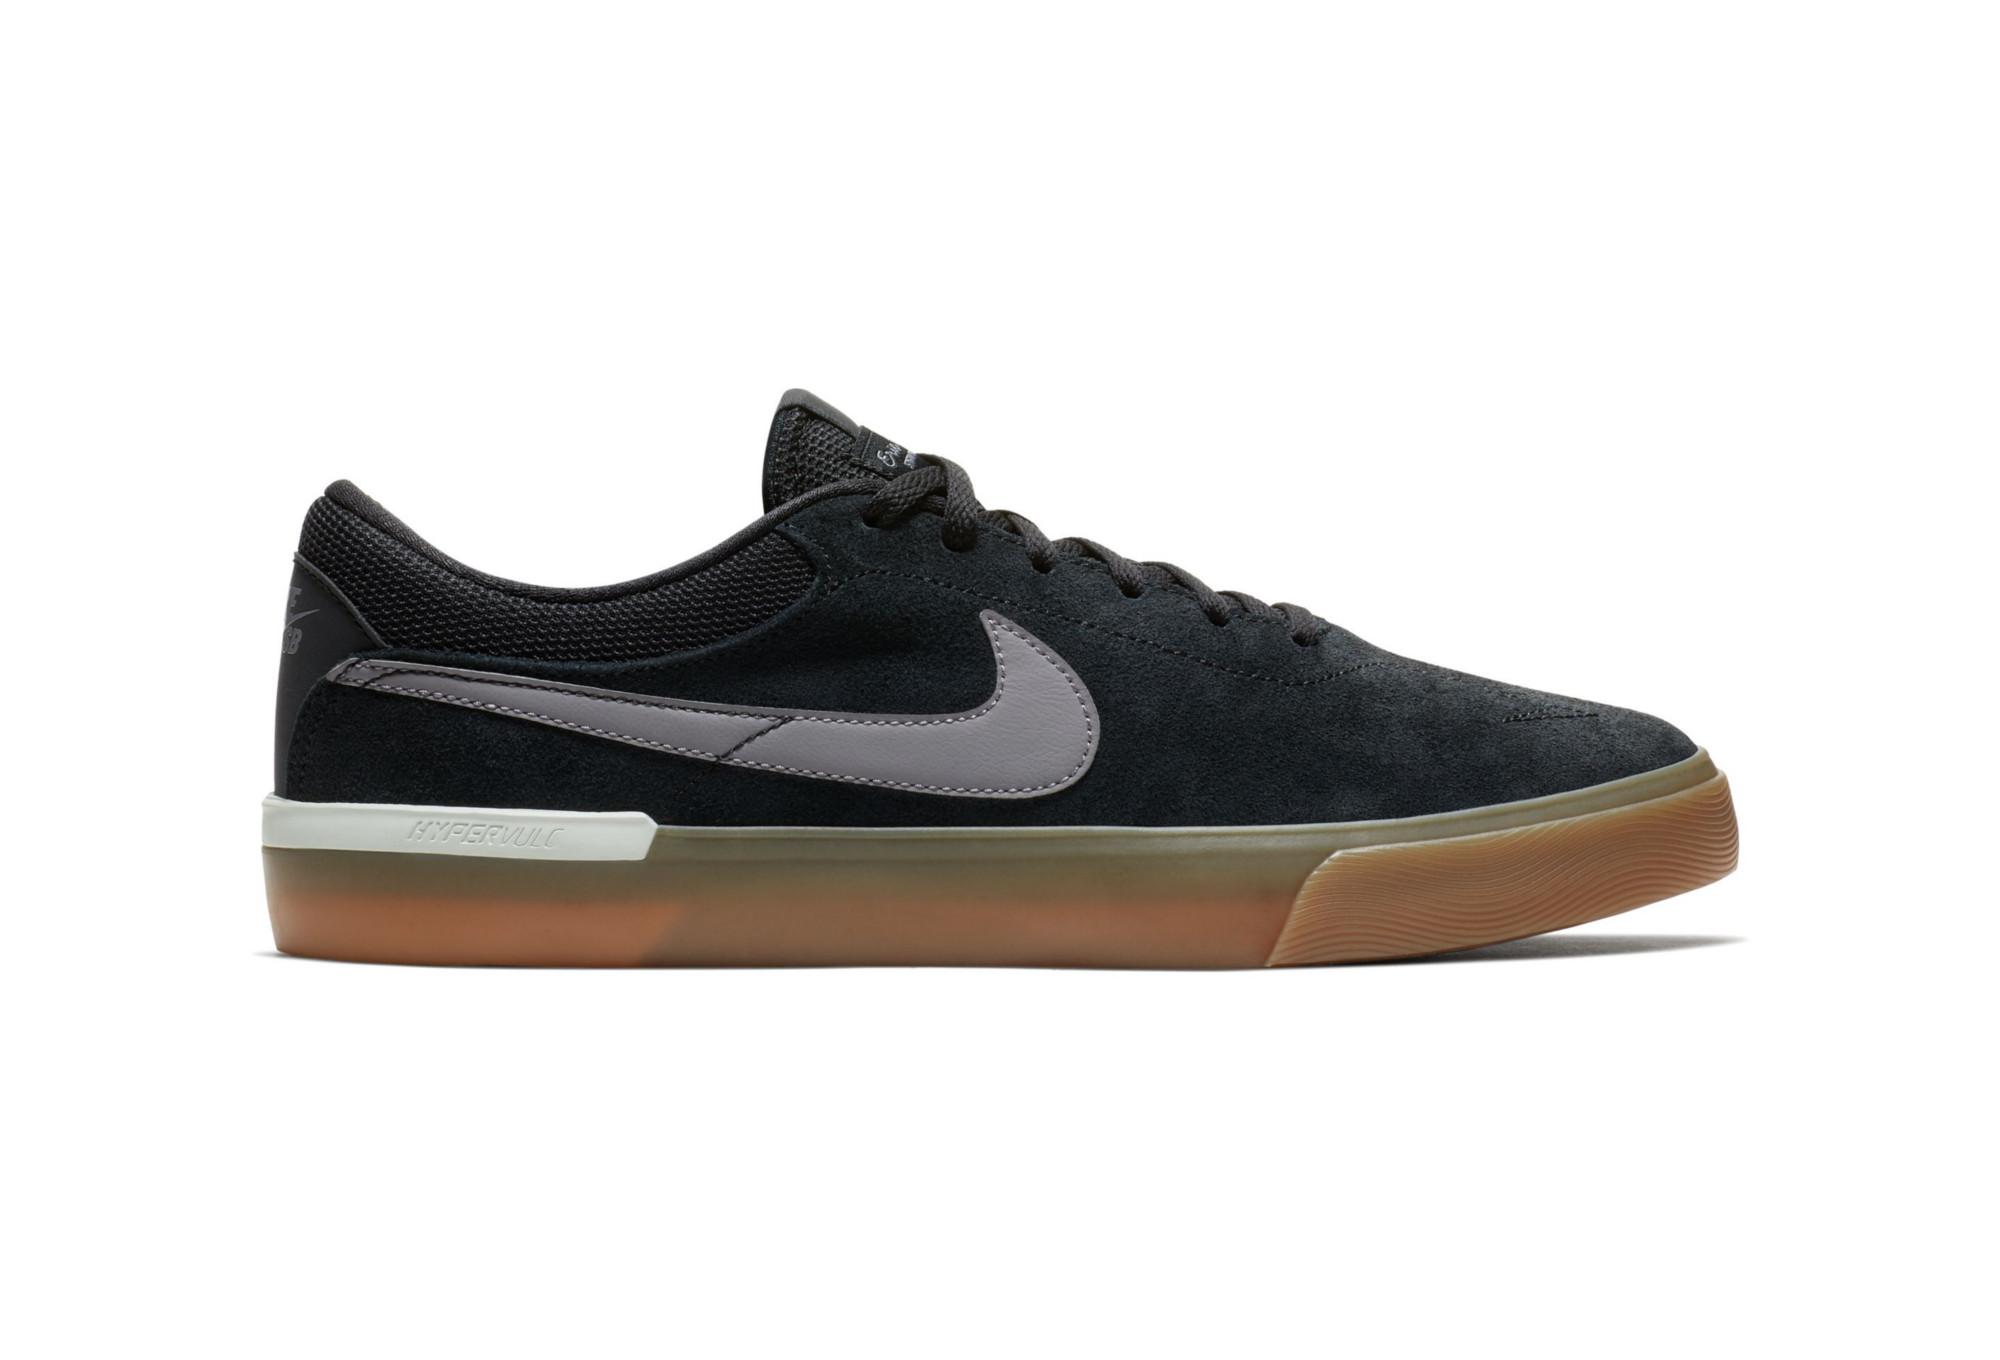 info for 70480 1bd81 Nike SB Hypervulc Eric Koston Shoes Black / Grey | Alltricks.com